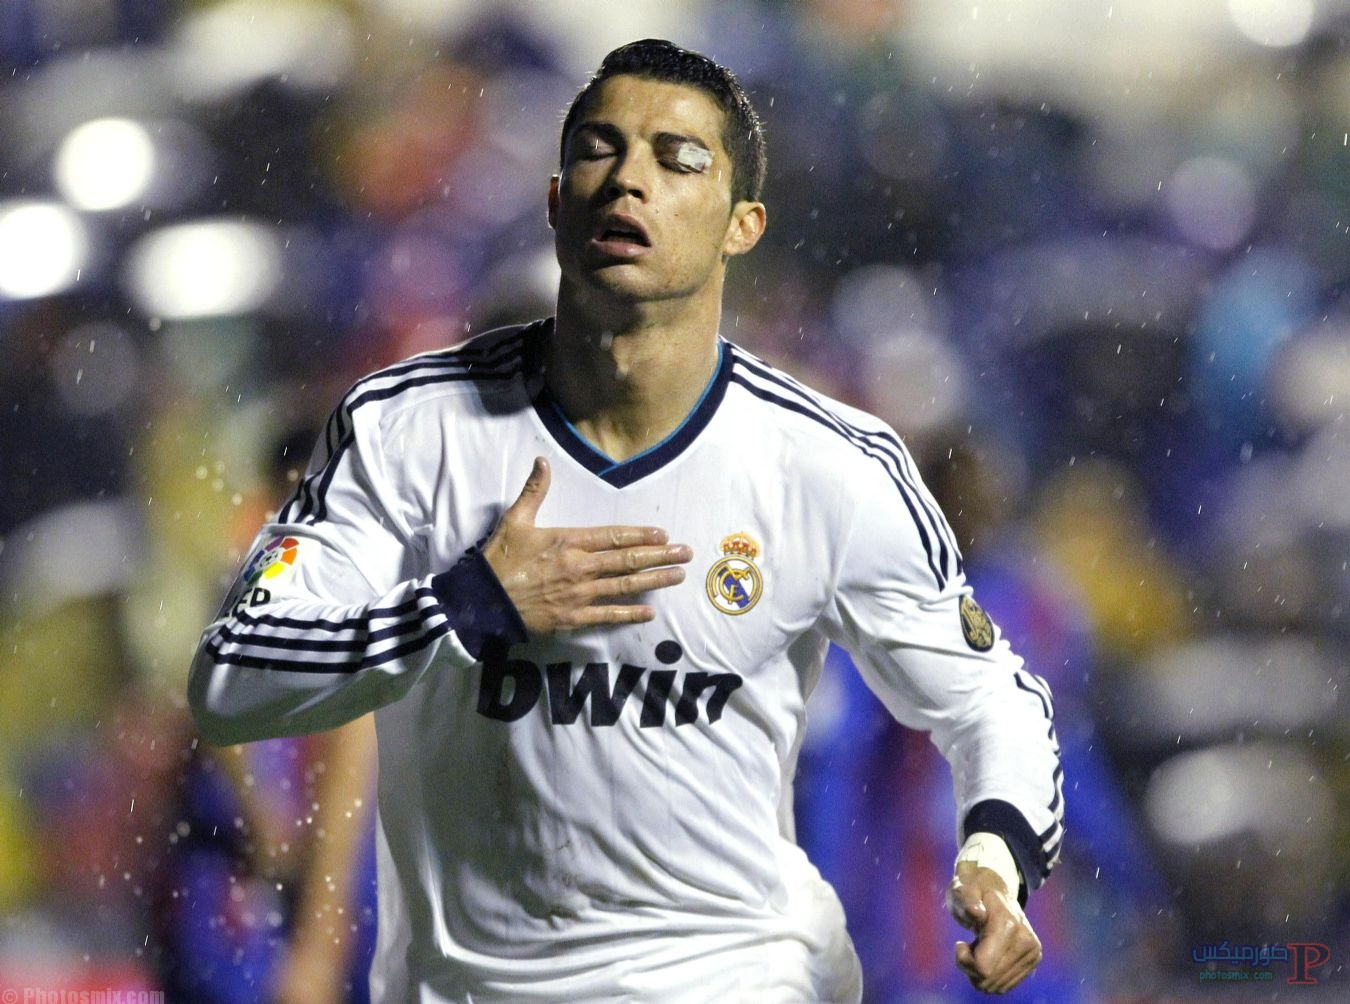 -رصور-رونالدو-بالملعب-1 صور كريستيانو رونالدو , اجمل صور Ronaldo 2018 , خلفيات ورمزيات رونالدو